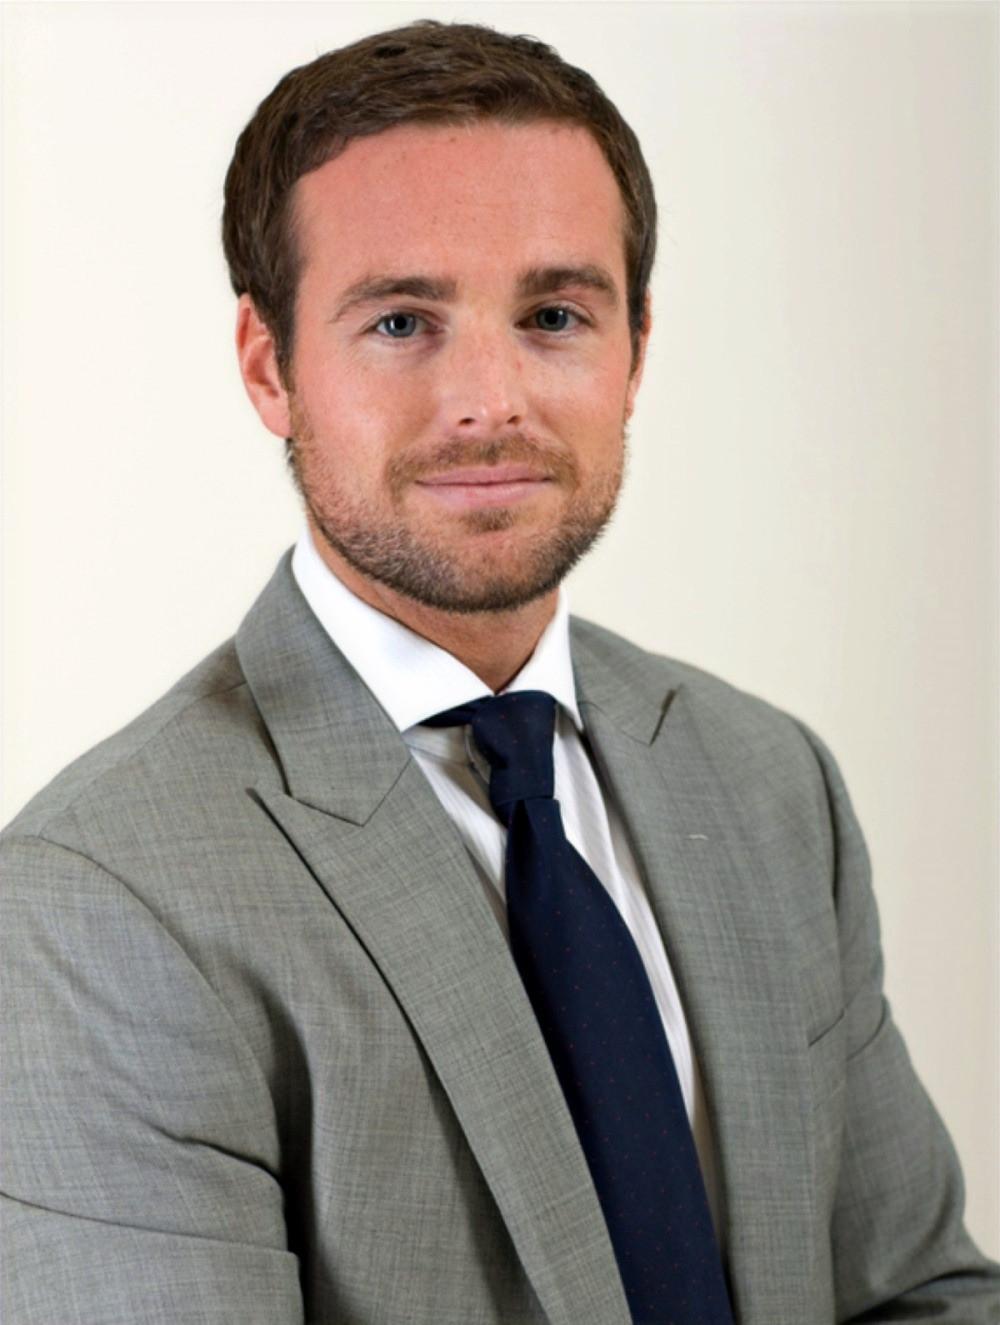 Tom Coleman, Exhibition Director for Informa Markets